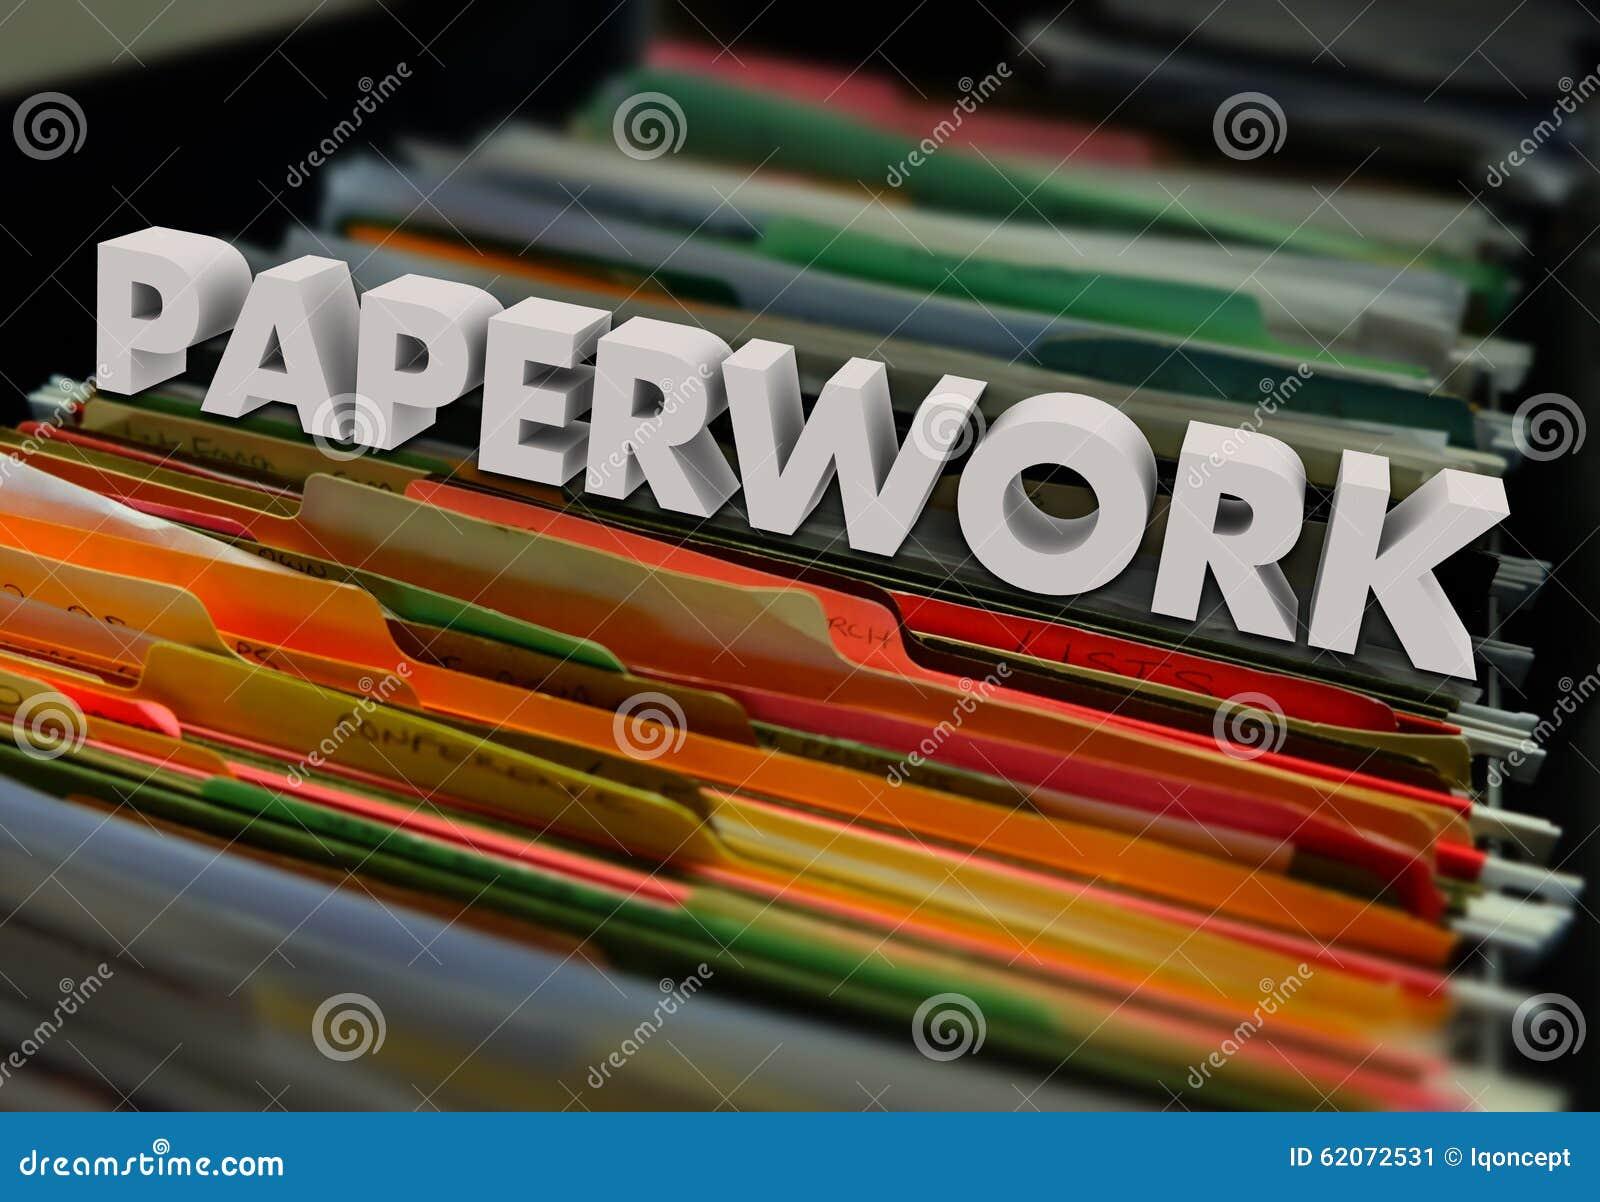 Paperwork File Folders Forms Processing Filing Stock Image